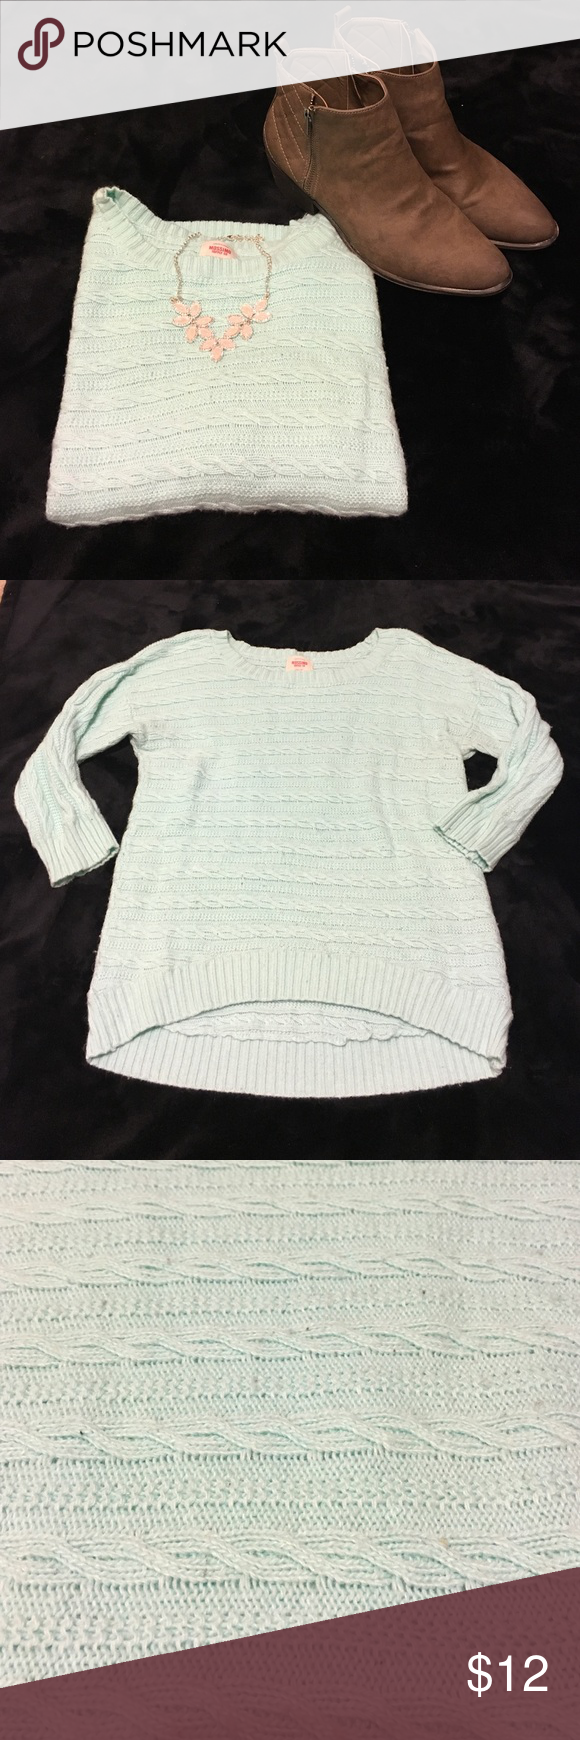 Light aqua crew neck sweater | Crew neck sweaters, High low and ...